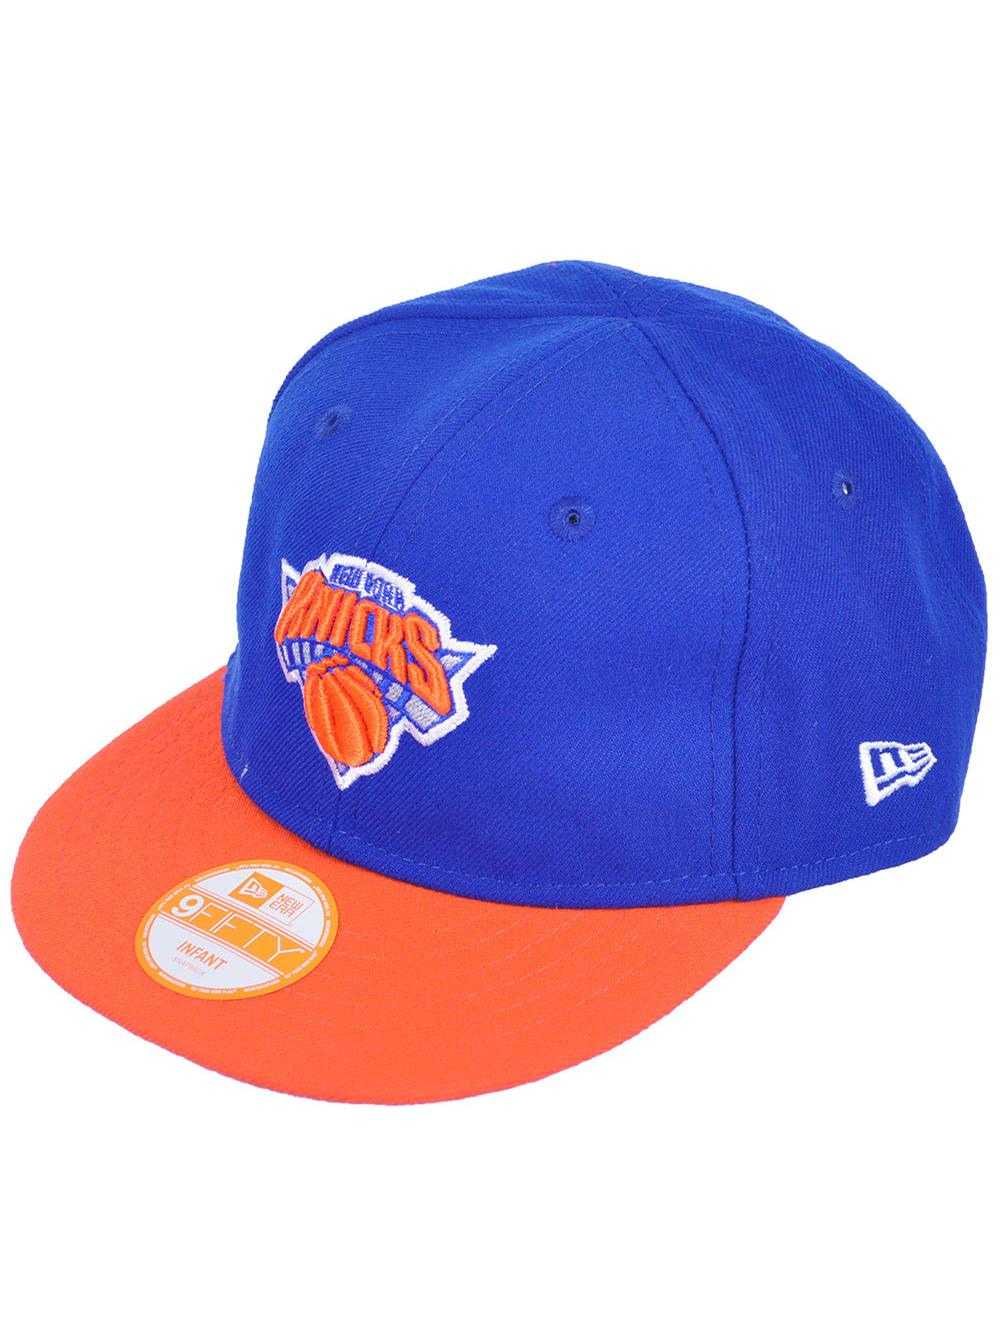 "New Era Knicks ""My 1st 950"" Snapback Cap (Infant One Size) edae8e3a0748"